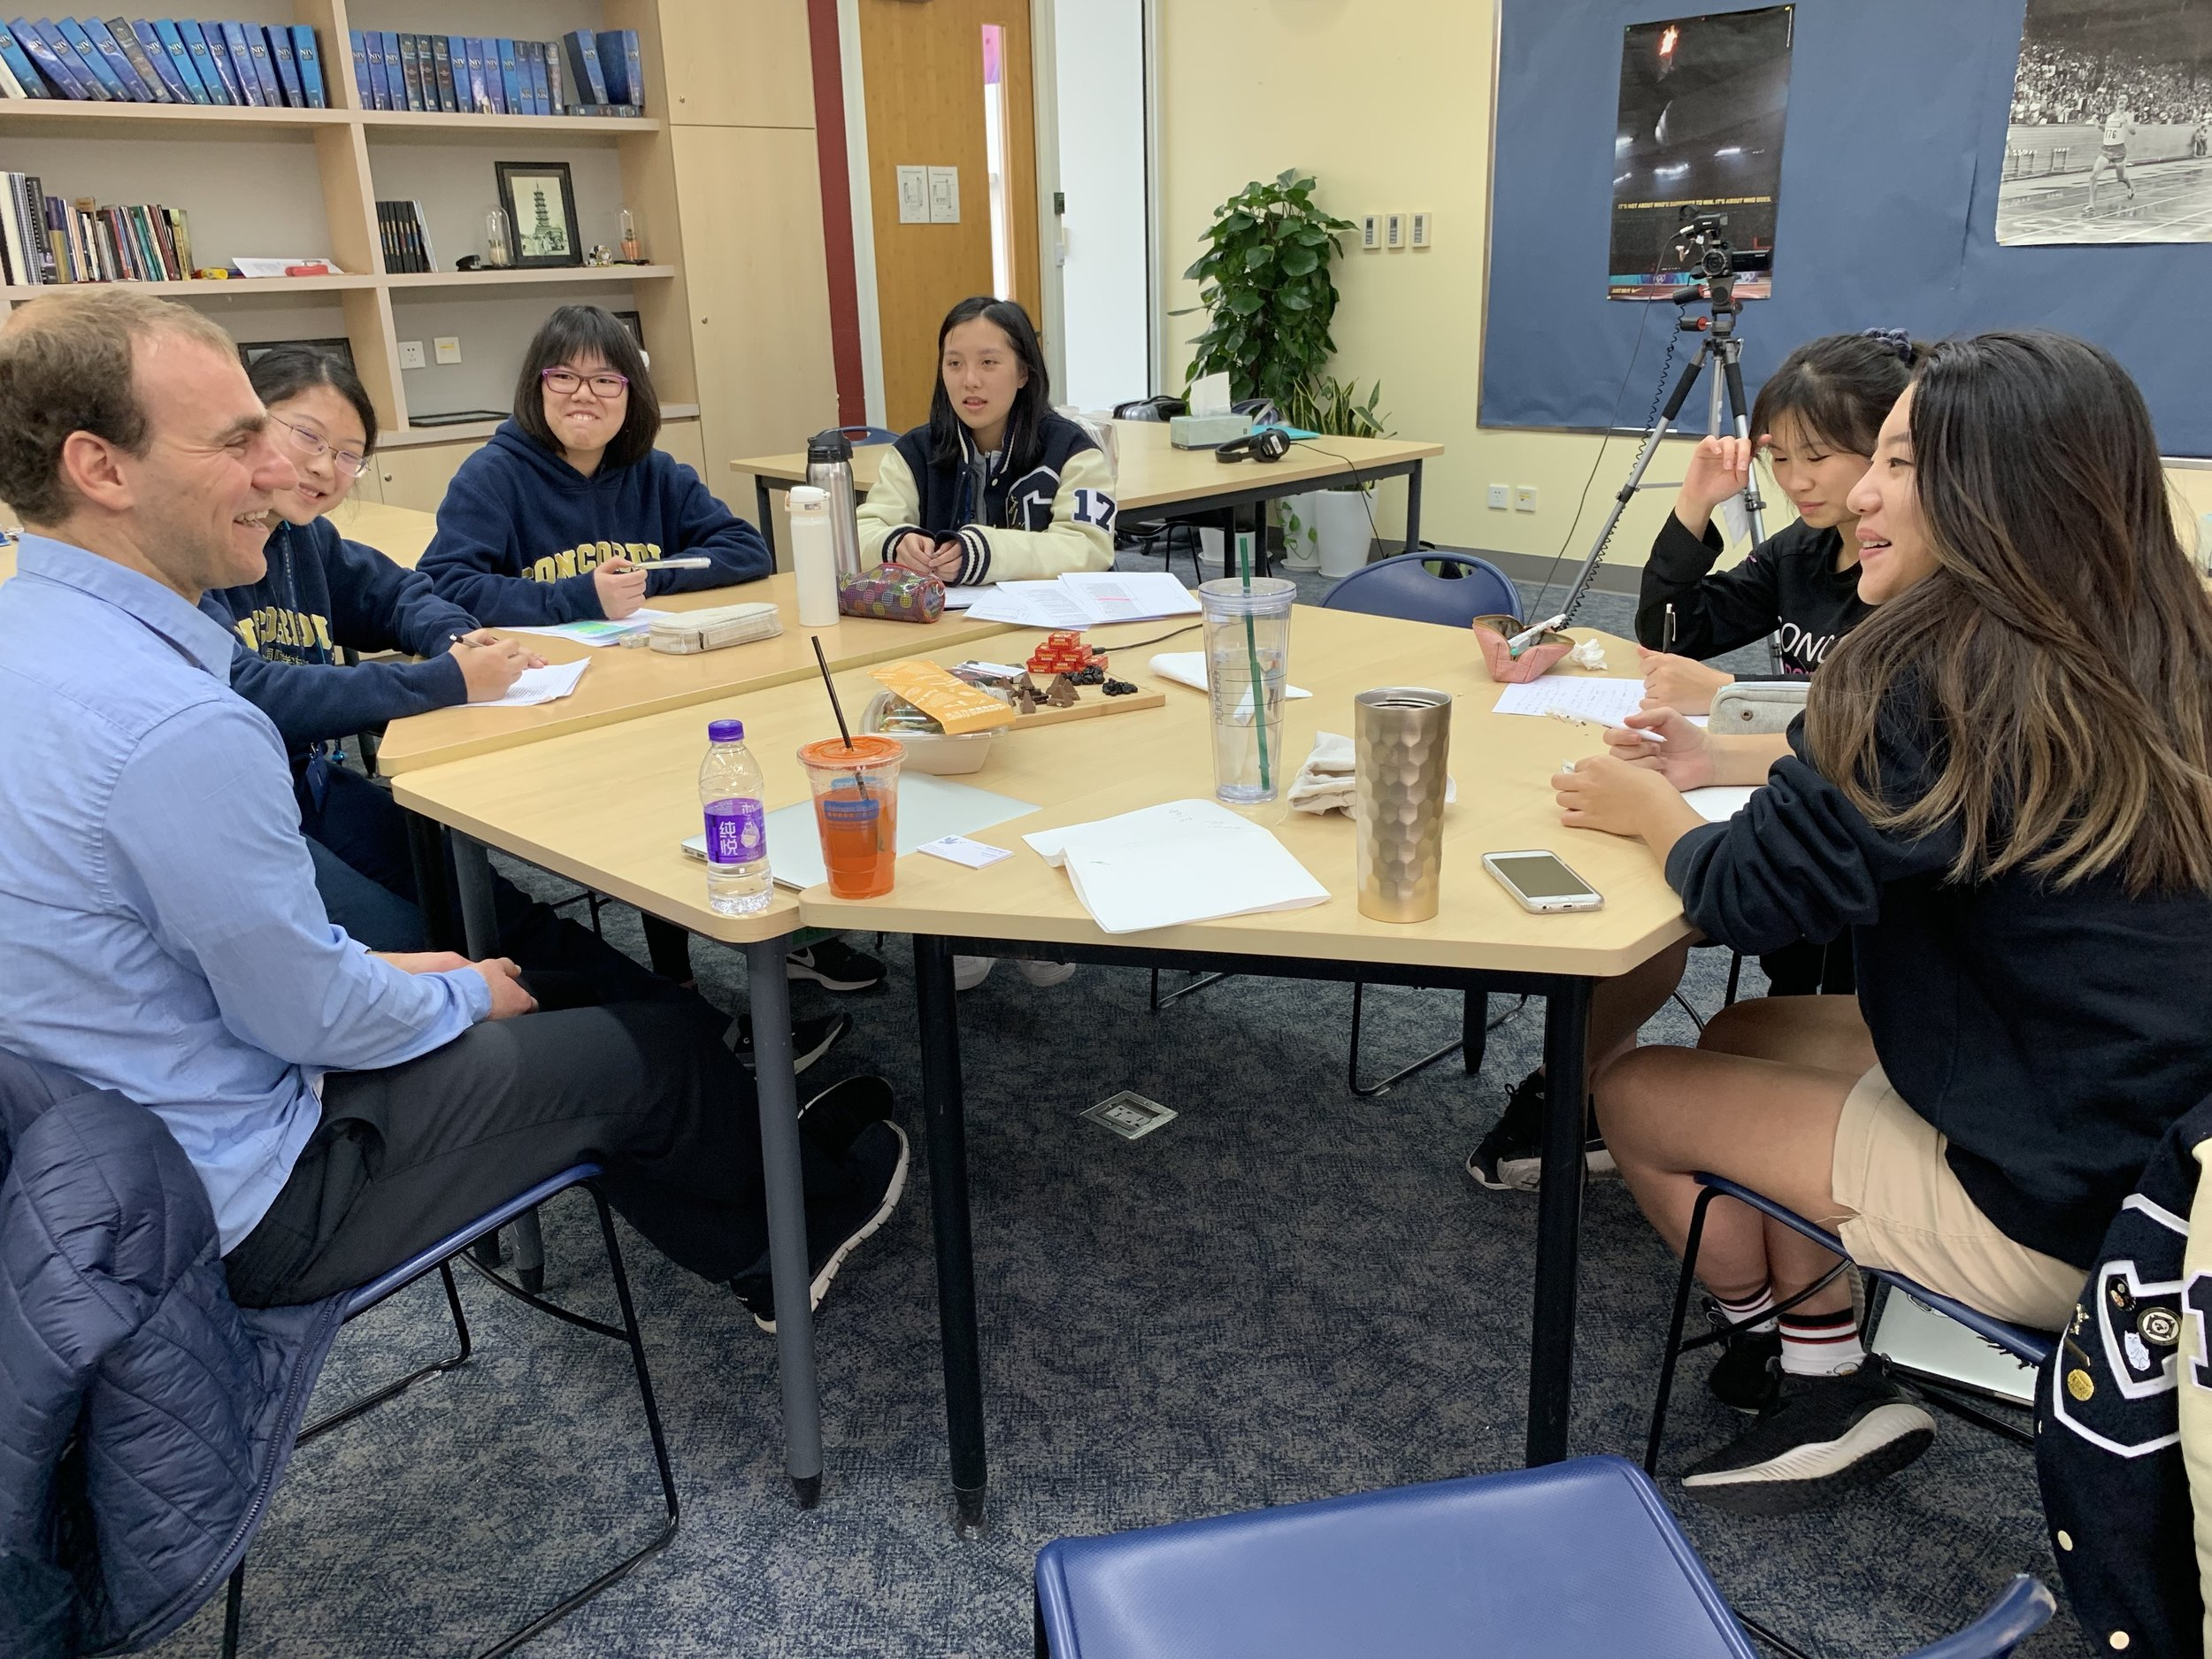 Jordan Hattar of Help4Refugees talking with Storytelling Agency students.